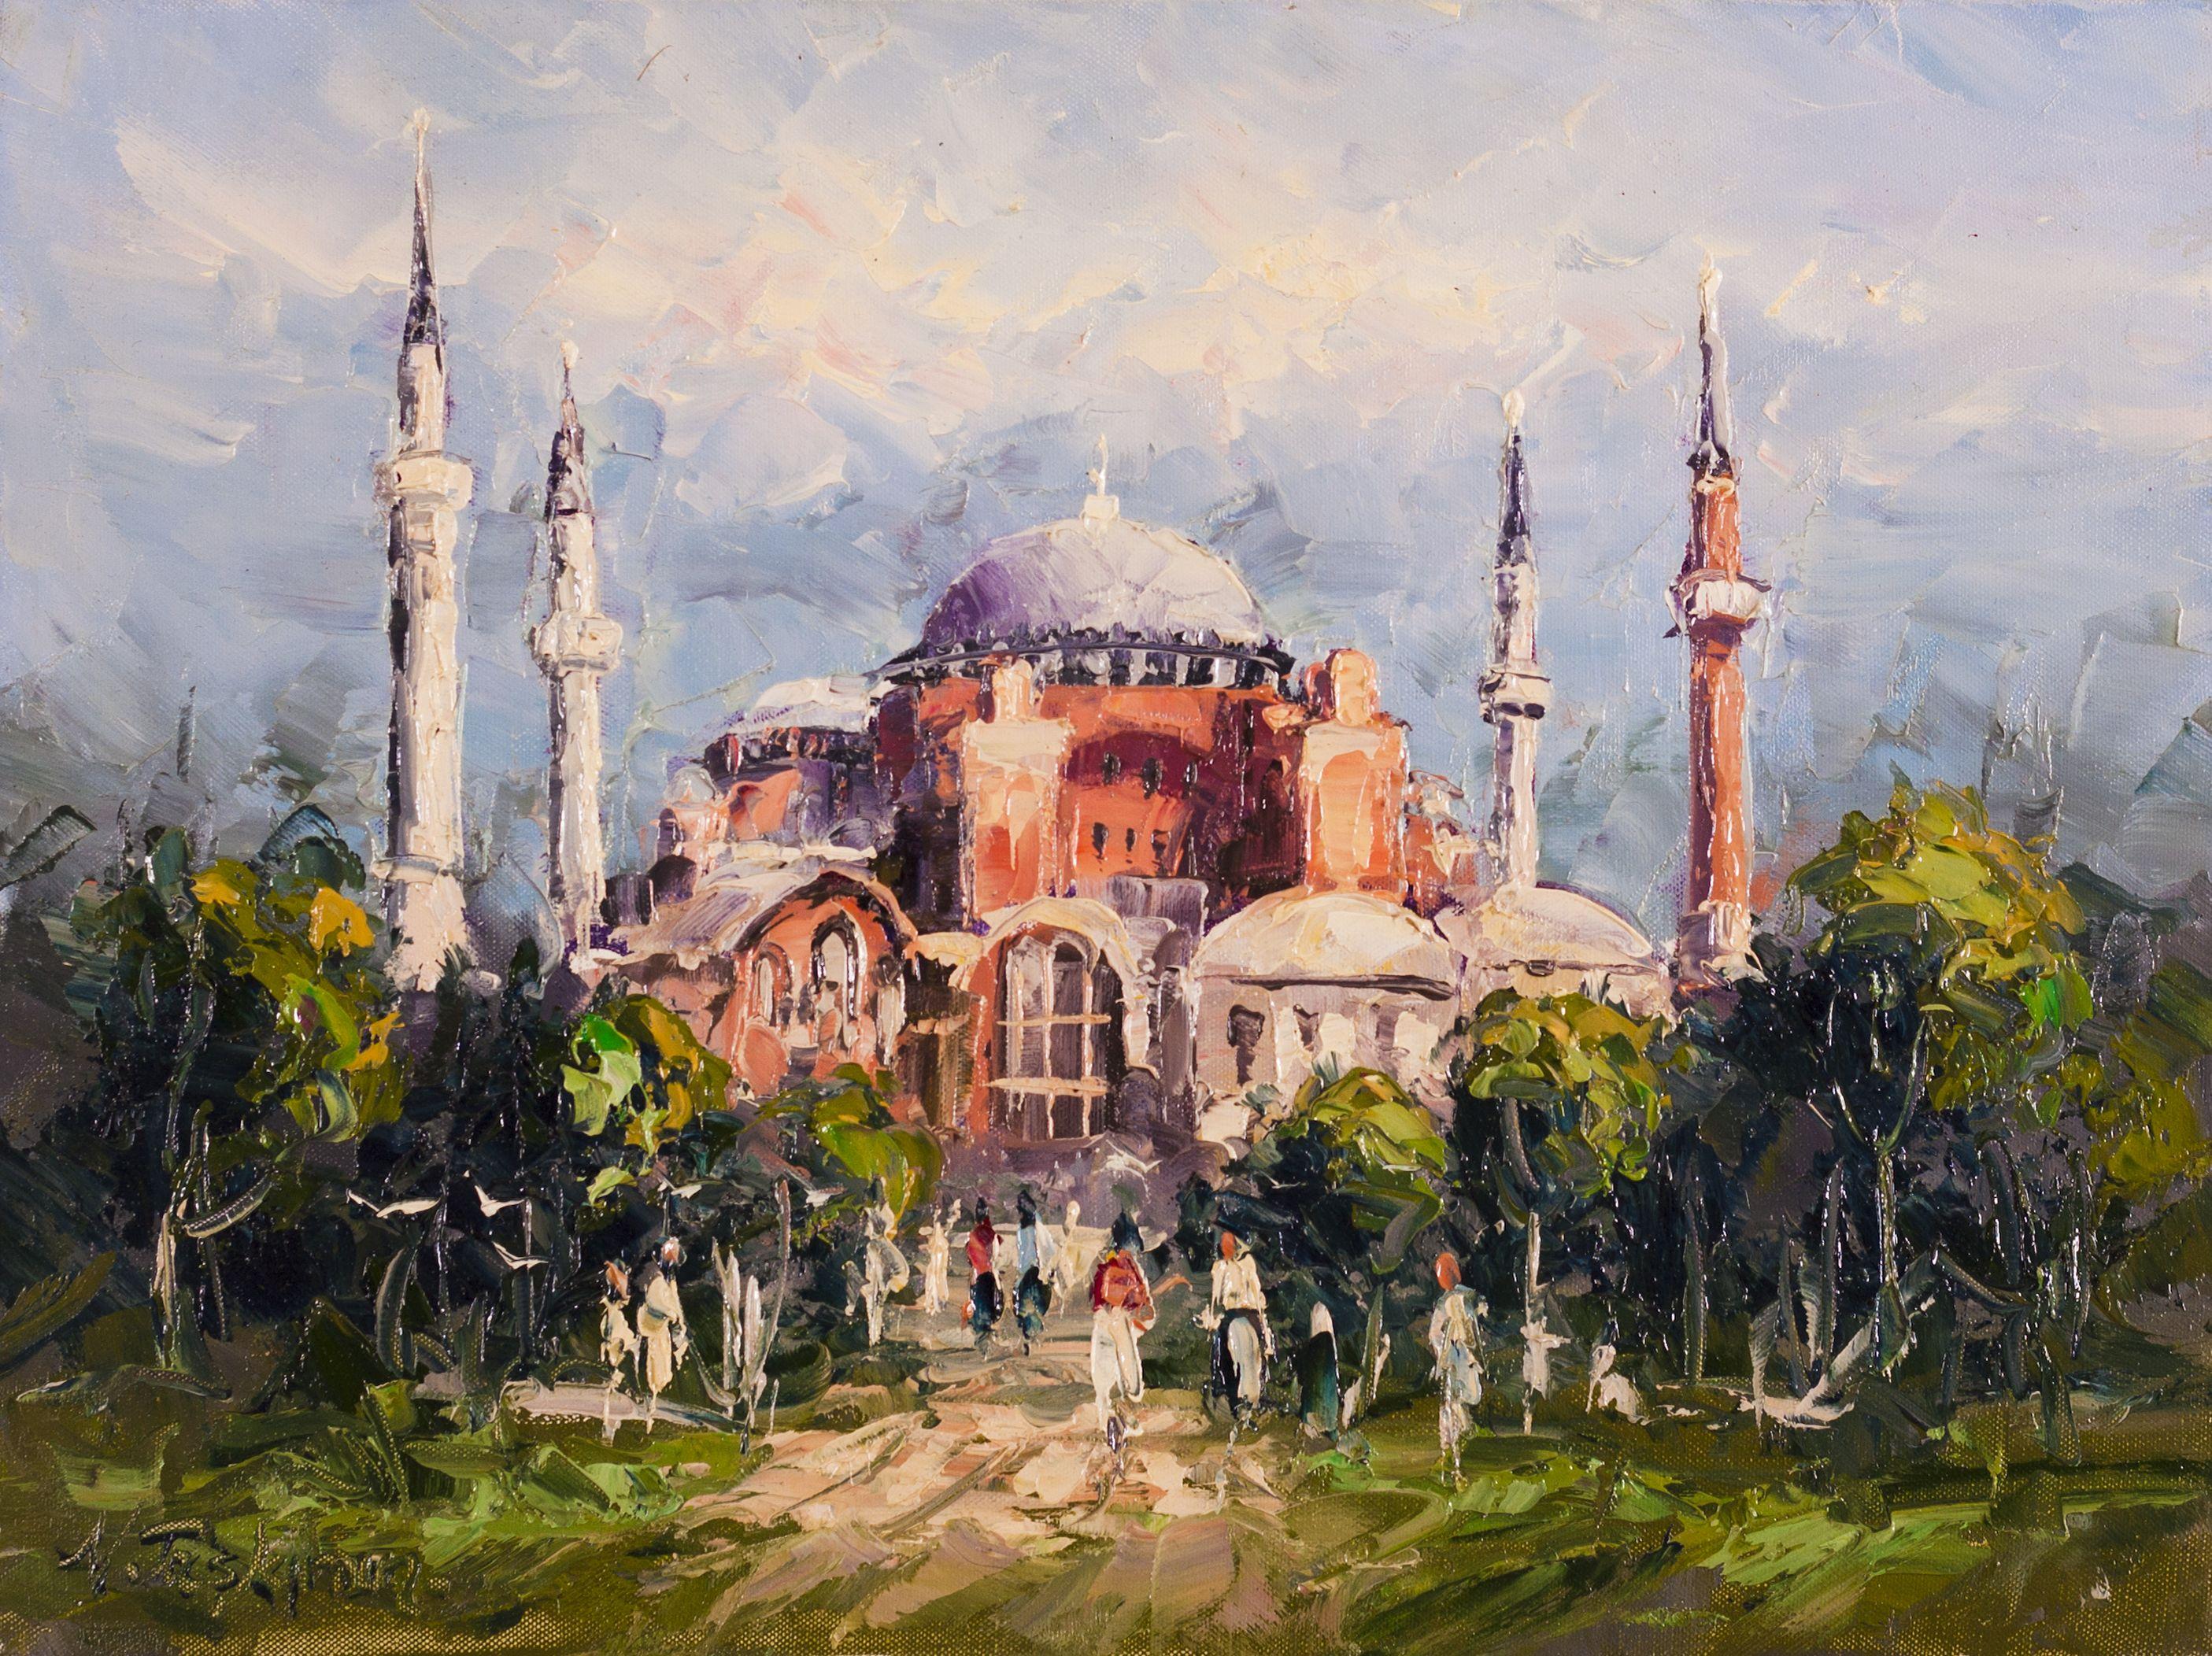 Ayasofya Nihat Taskiran Simurg Resim Ve Cerceve Hagia Sophia Resimler Resim